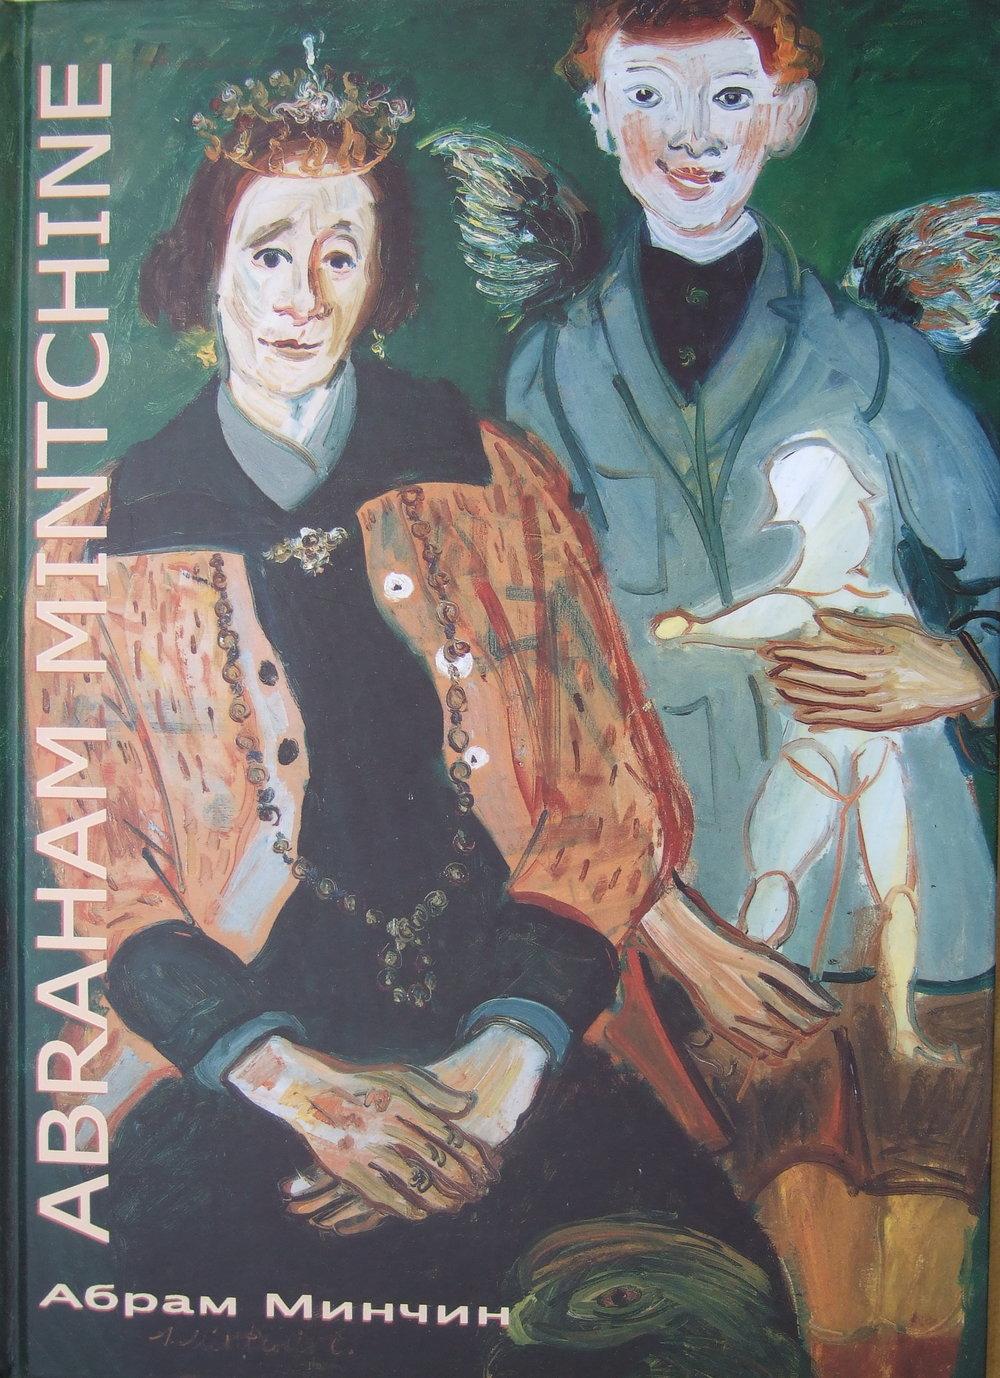 Mintchine Abraham by M. Di Veroli, 2005.